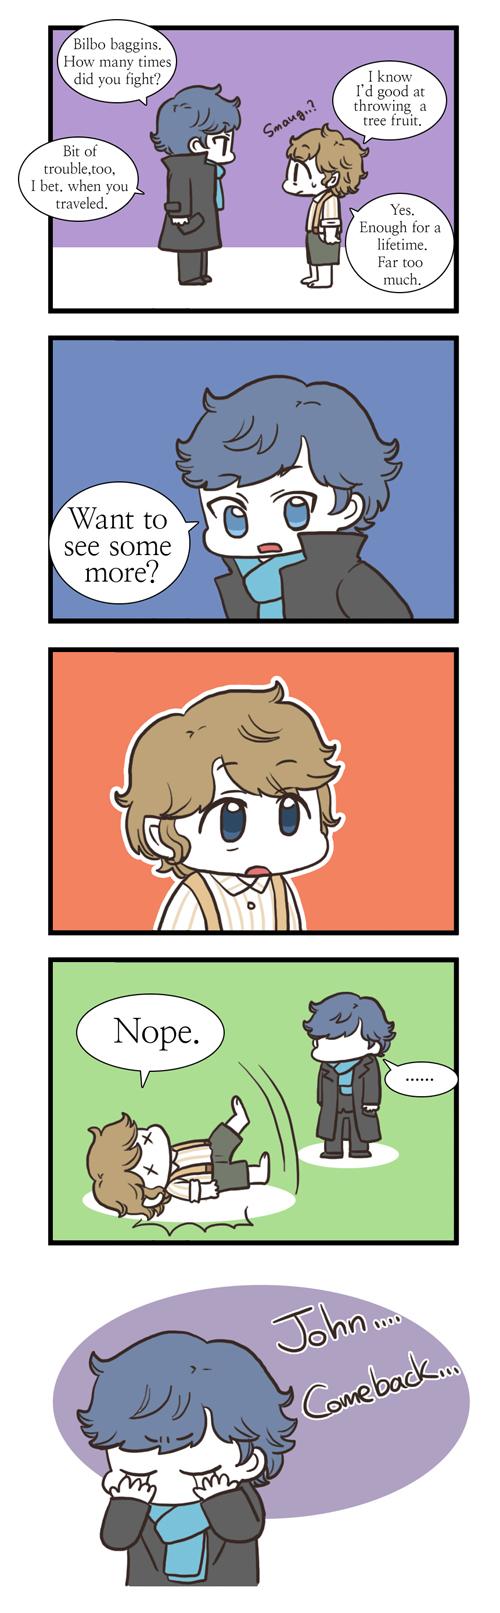 [CROSSOVER] Sherlock meet Bilbo by twosugars16